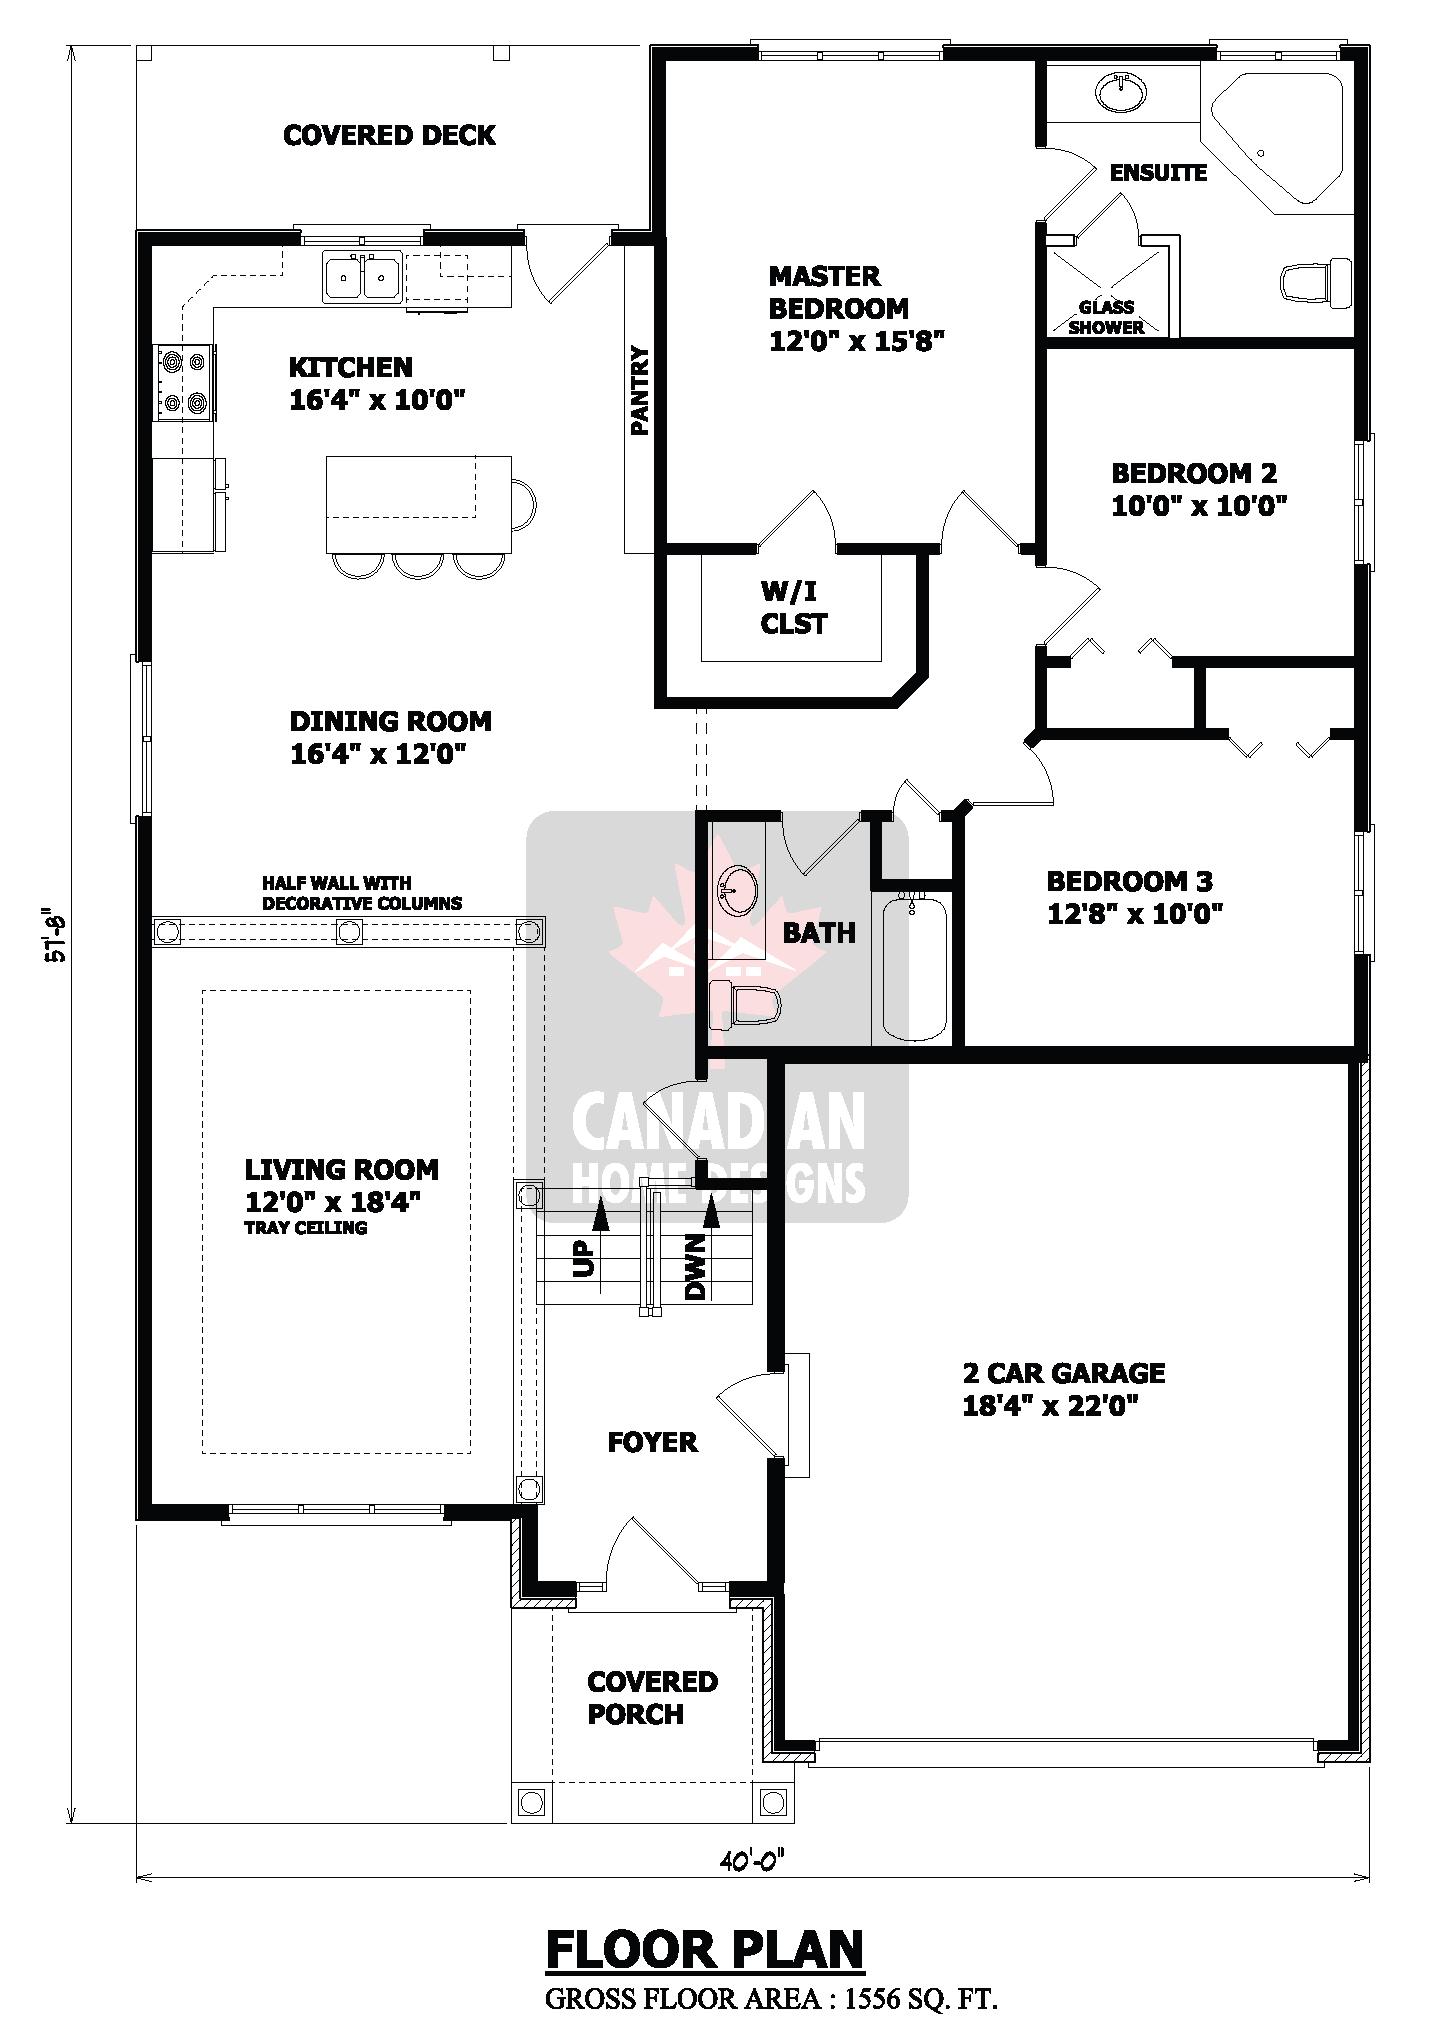 Cornwallfloor Png 1435 2034 Small House Floor Plans Small House Plans Small House Plans Free